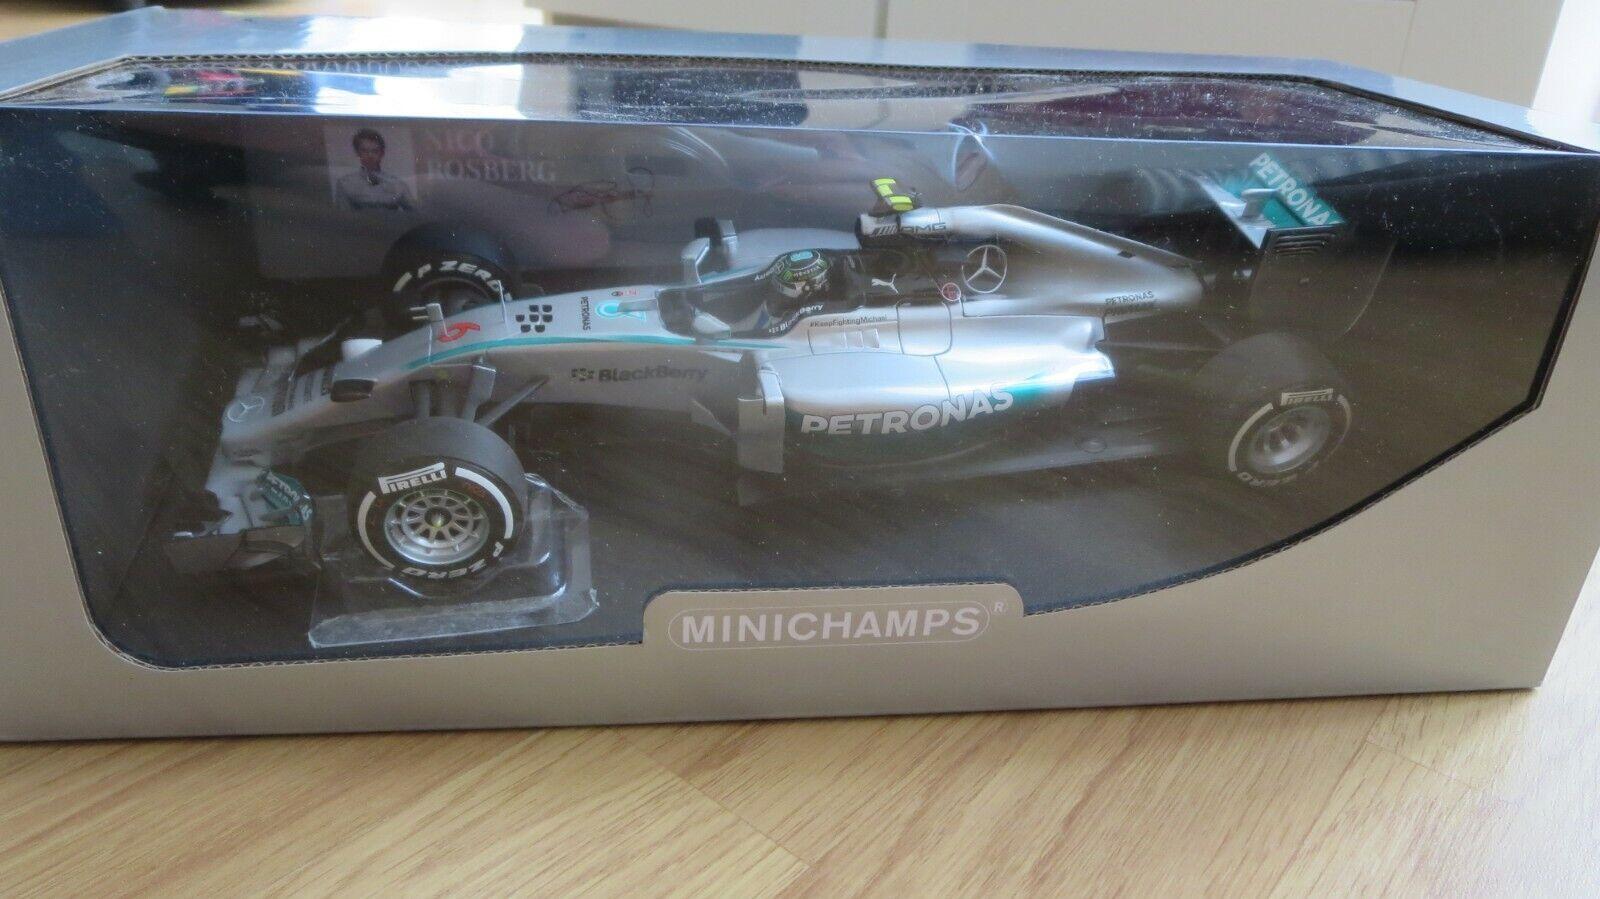 MINICHAMPS 1 18 MERCEDES AMG PETRONAS F1 TEAM ROSBERG WINNER GP AUSTRALIE 2014 N